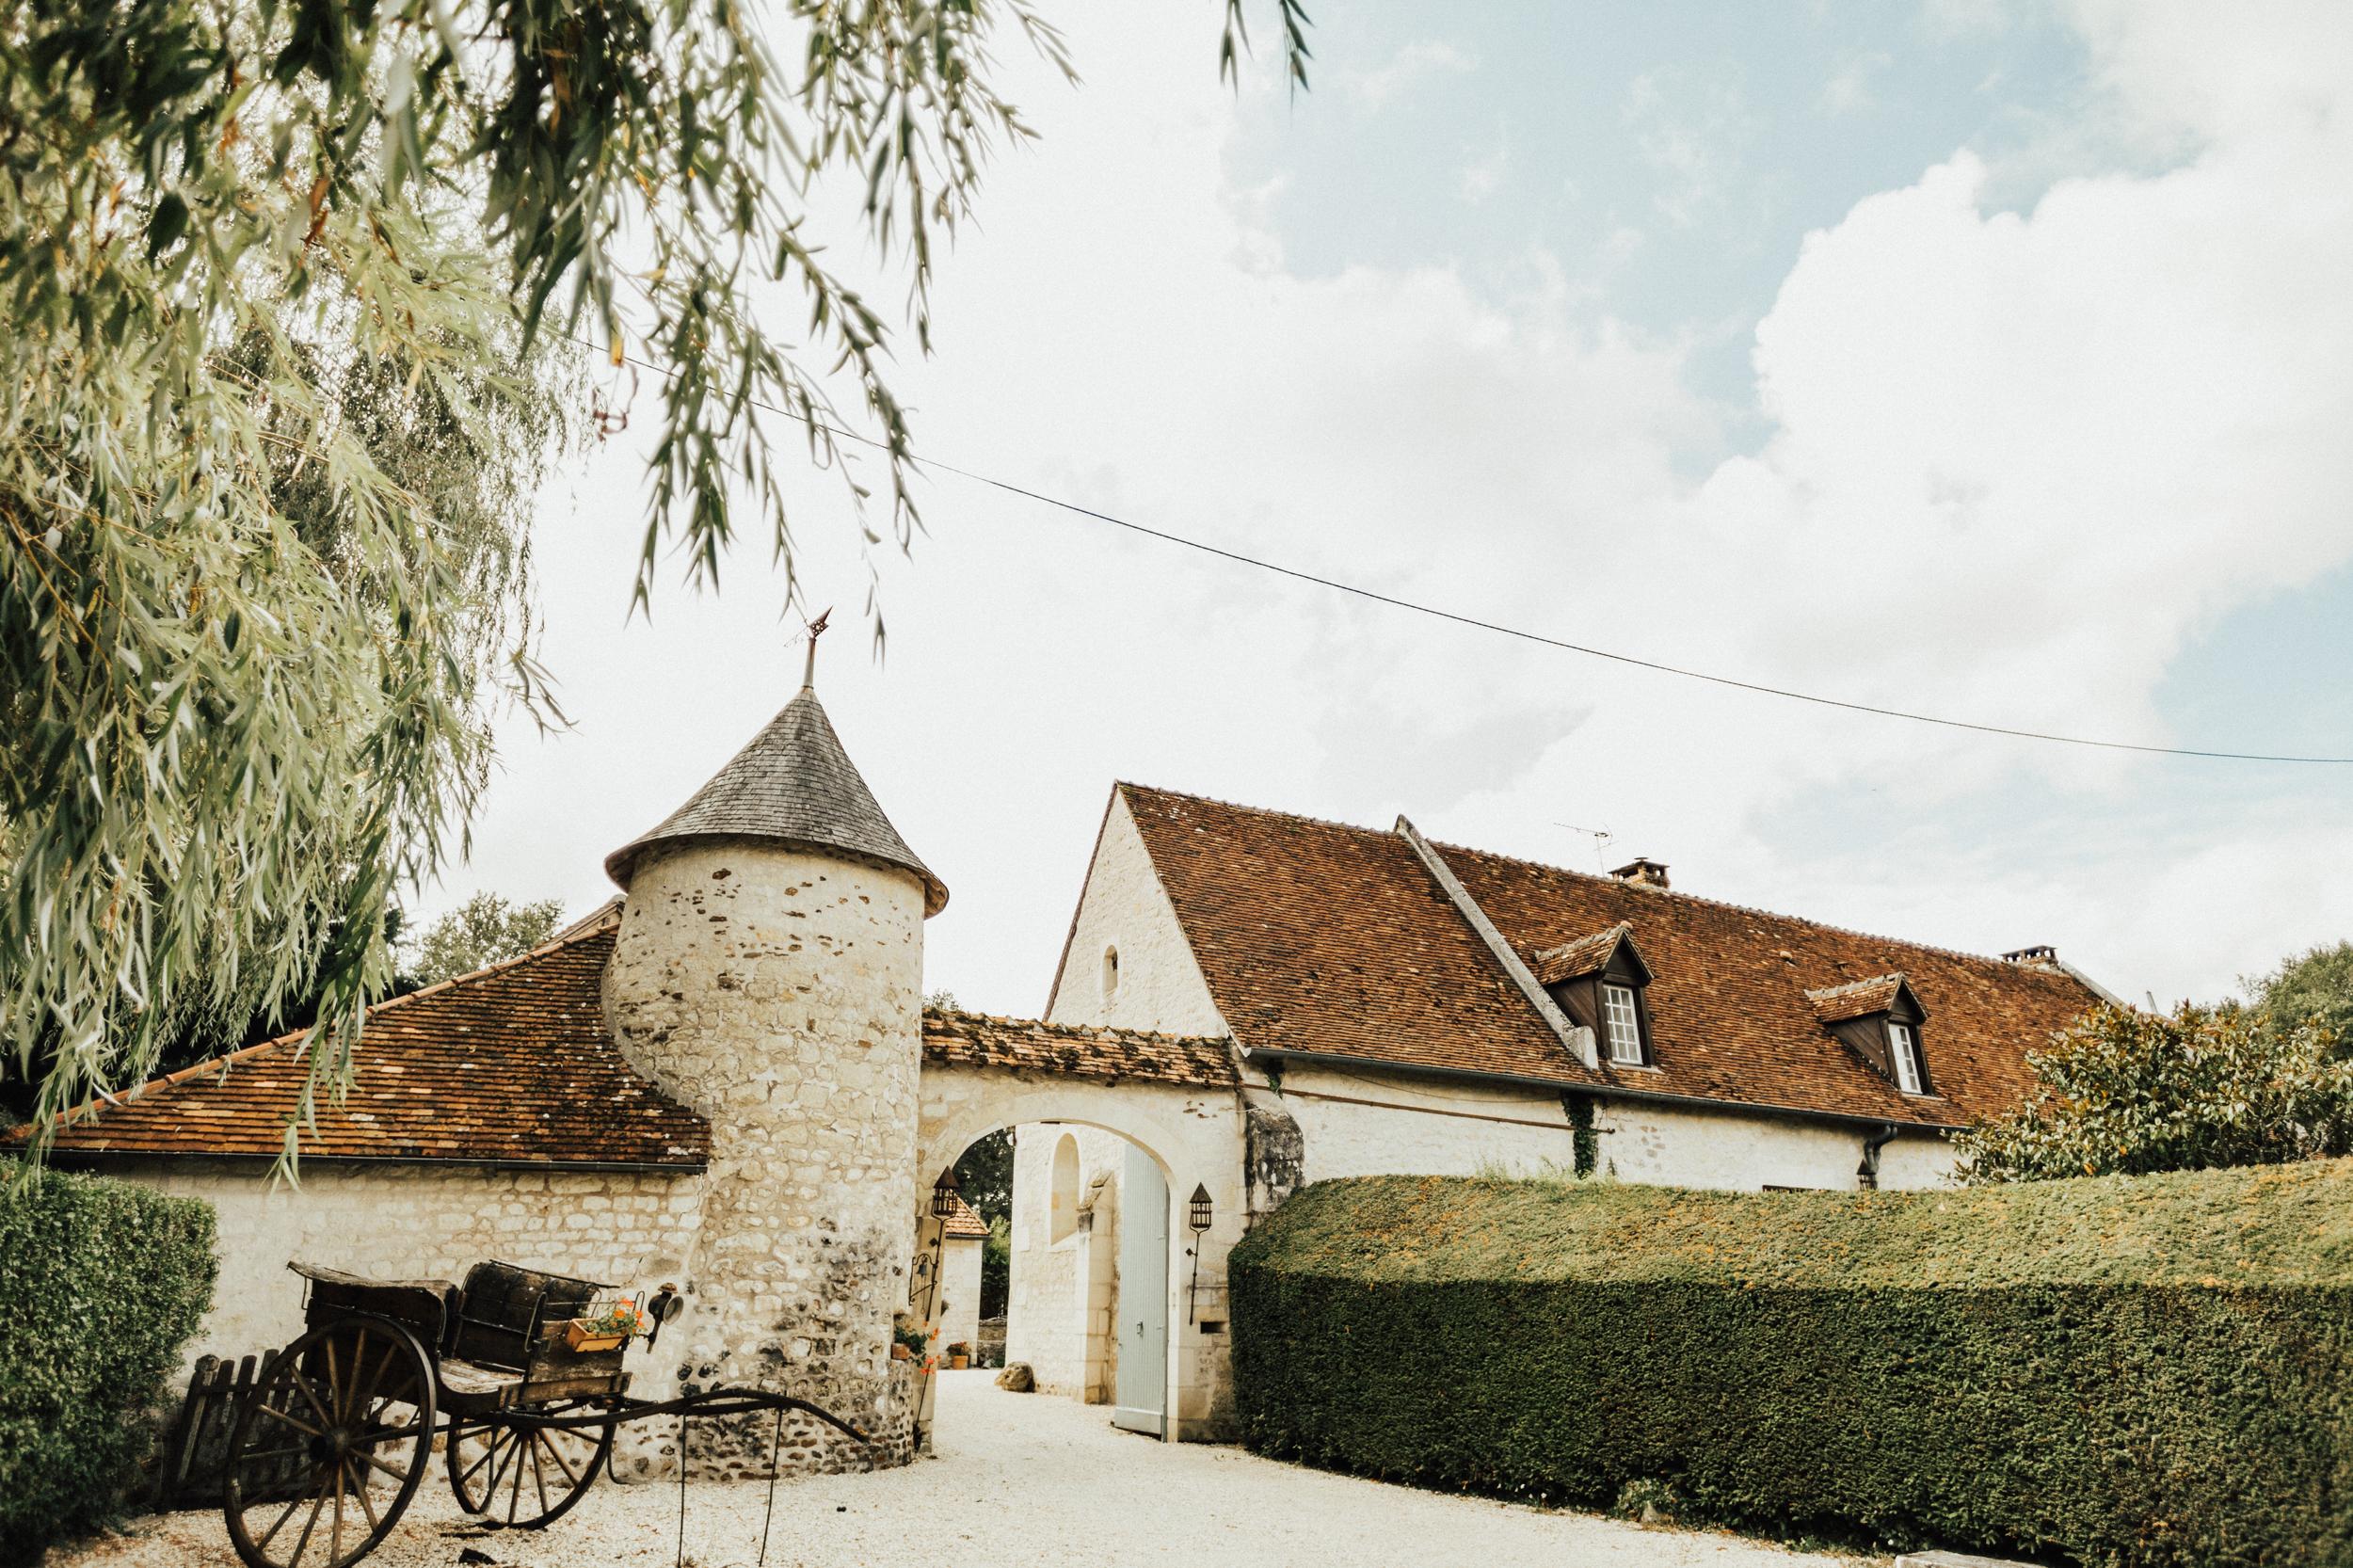 Amy-Zac-Destination-Wedding-France-Manoir-Foulquetiere-Darina-Stoda-Photography-3.jpg